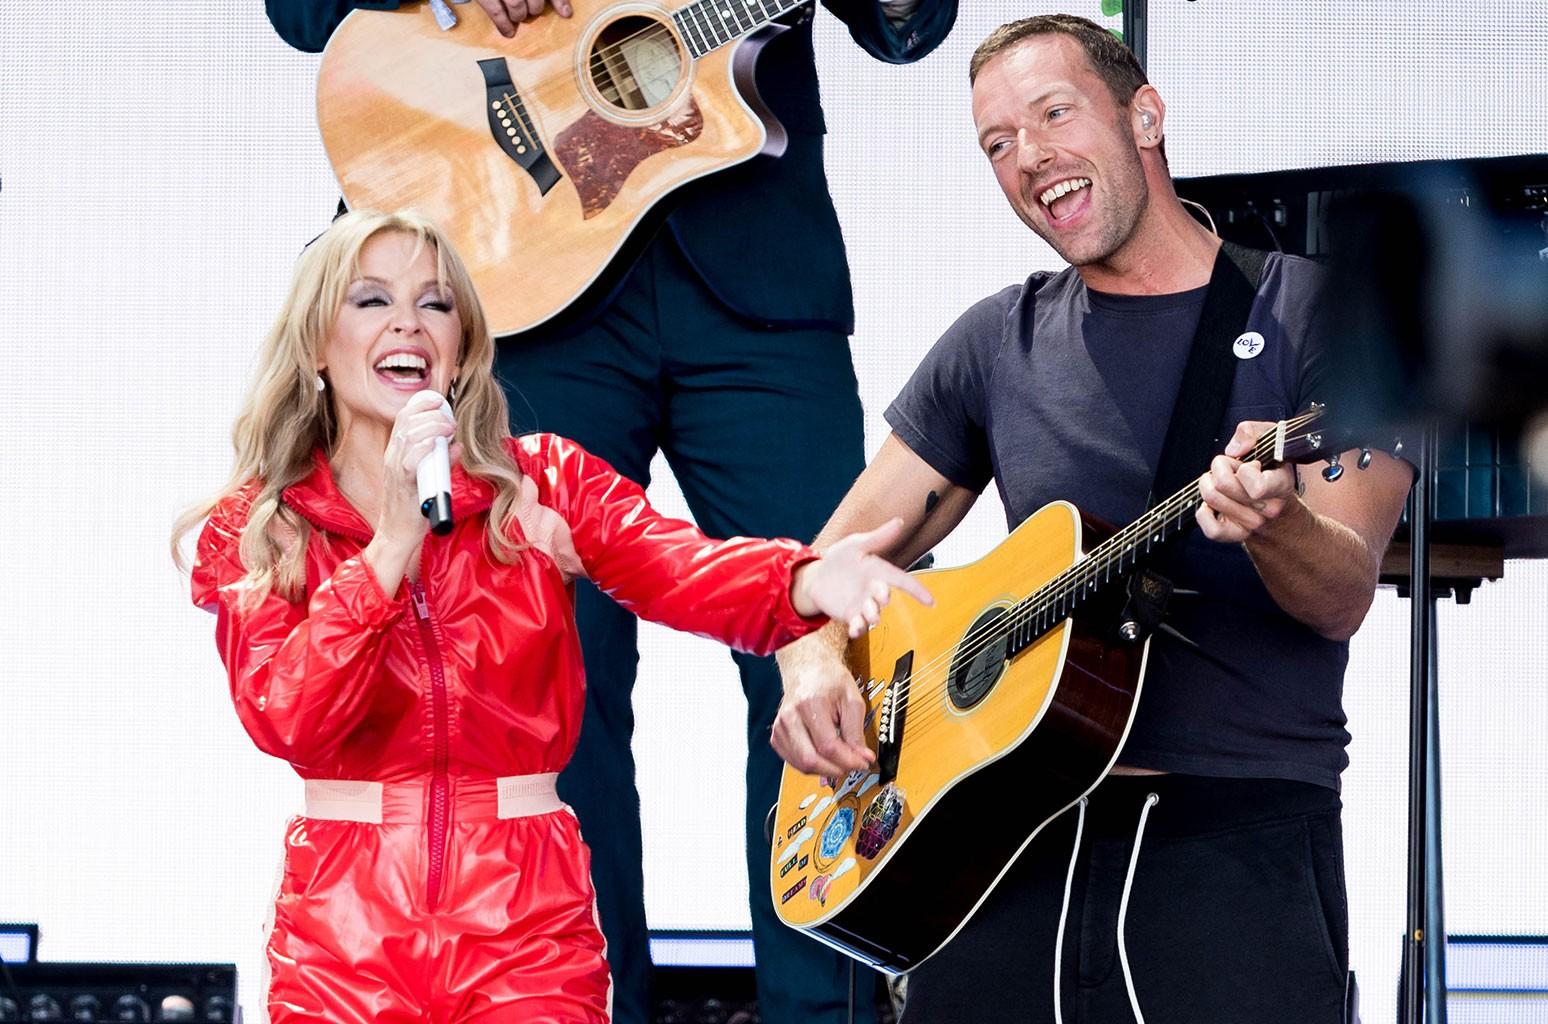 Kylie Minogue and Chris Martin